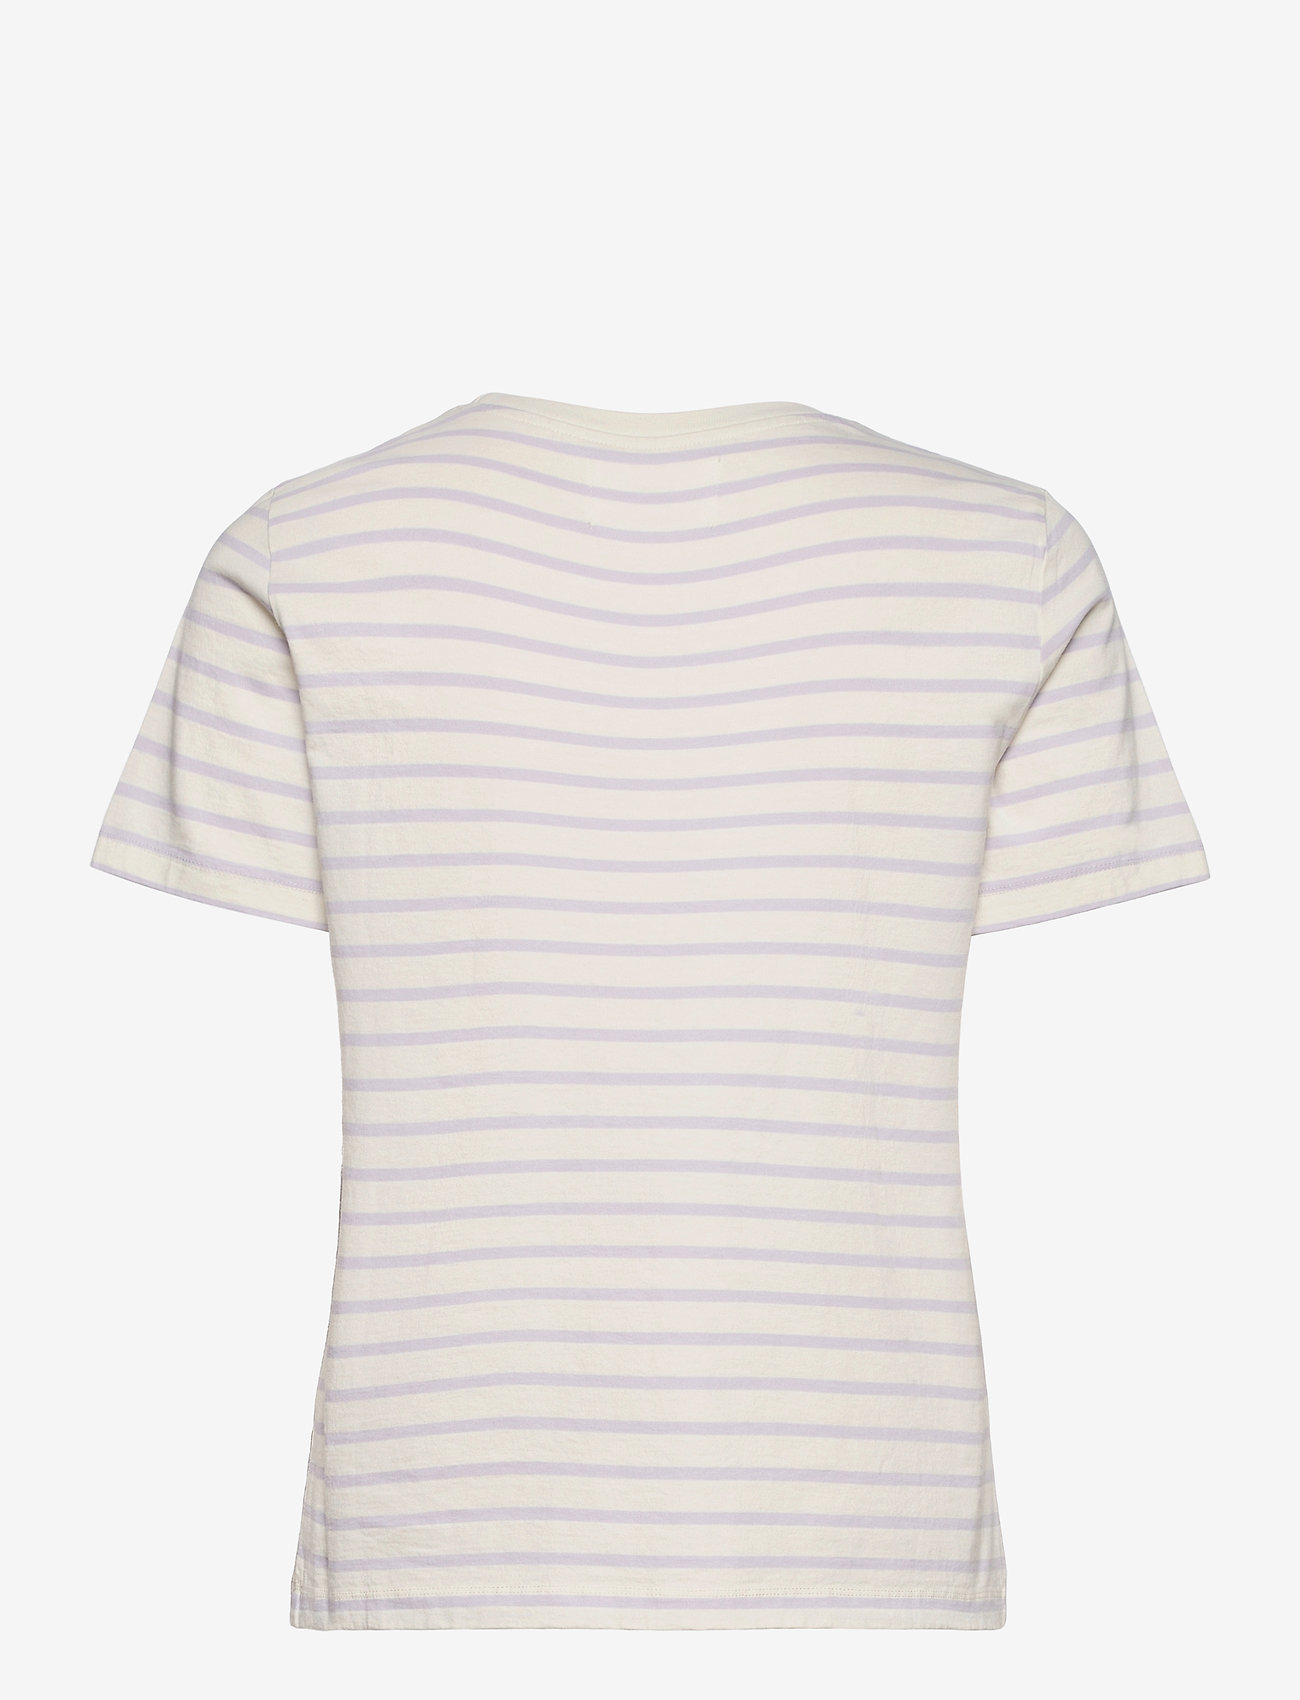 Wood Wood - Mia T-shirt - t-shirts - off-white/lilac stripes - 1